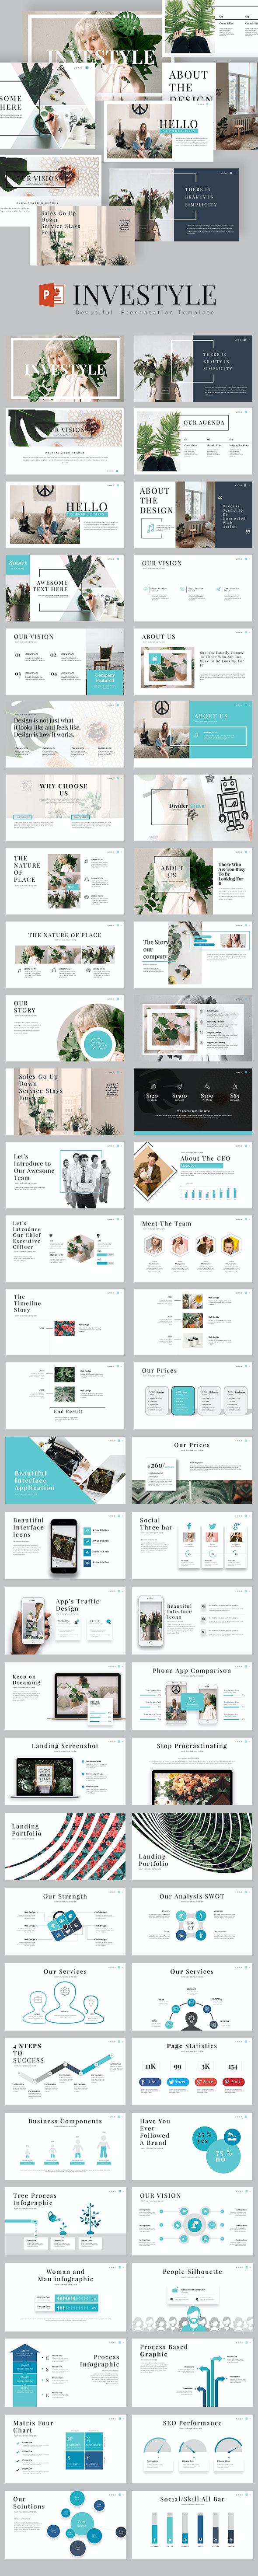 Investyle Powerpoint Presentation - Creative PowerPoint Templates